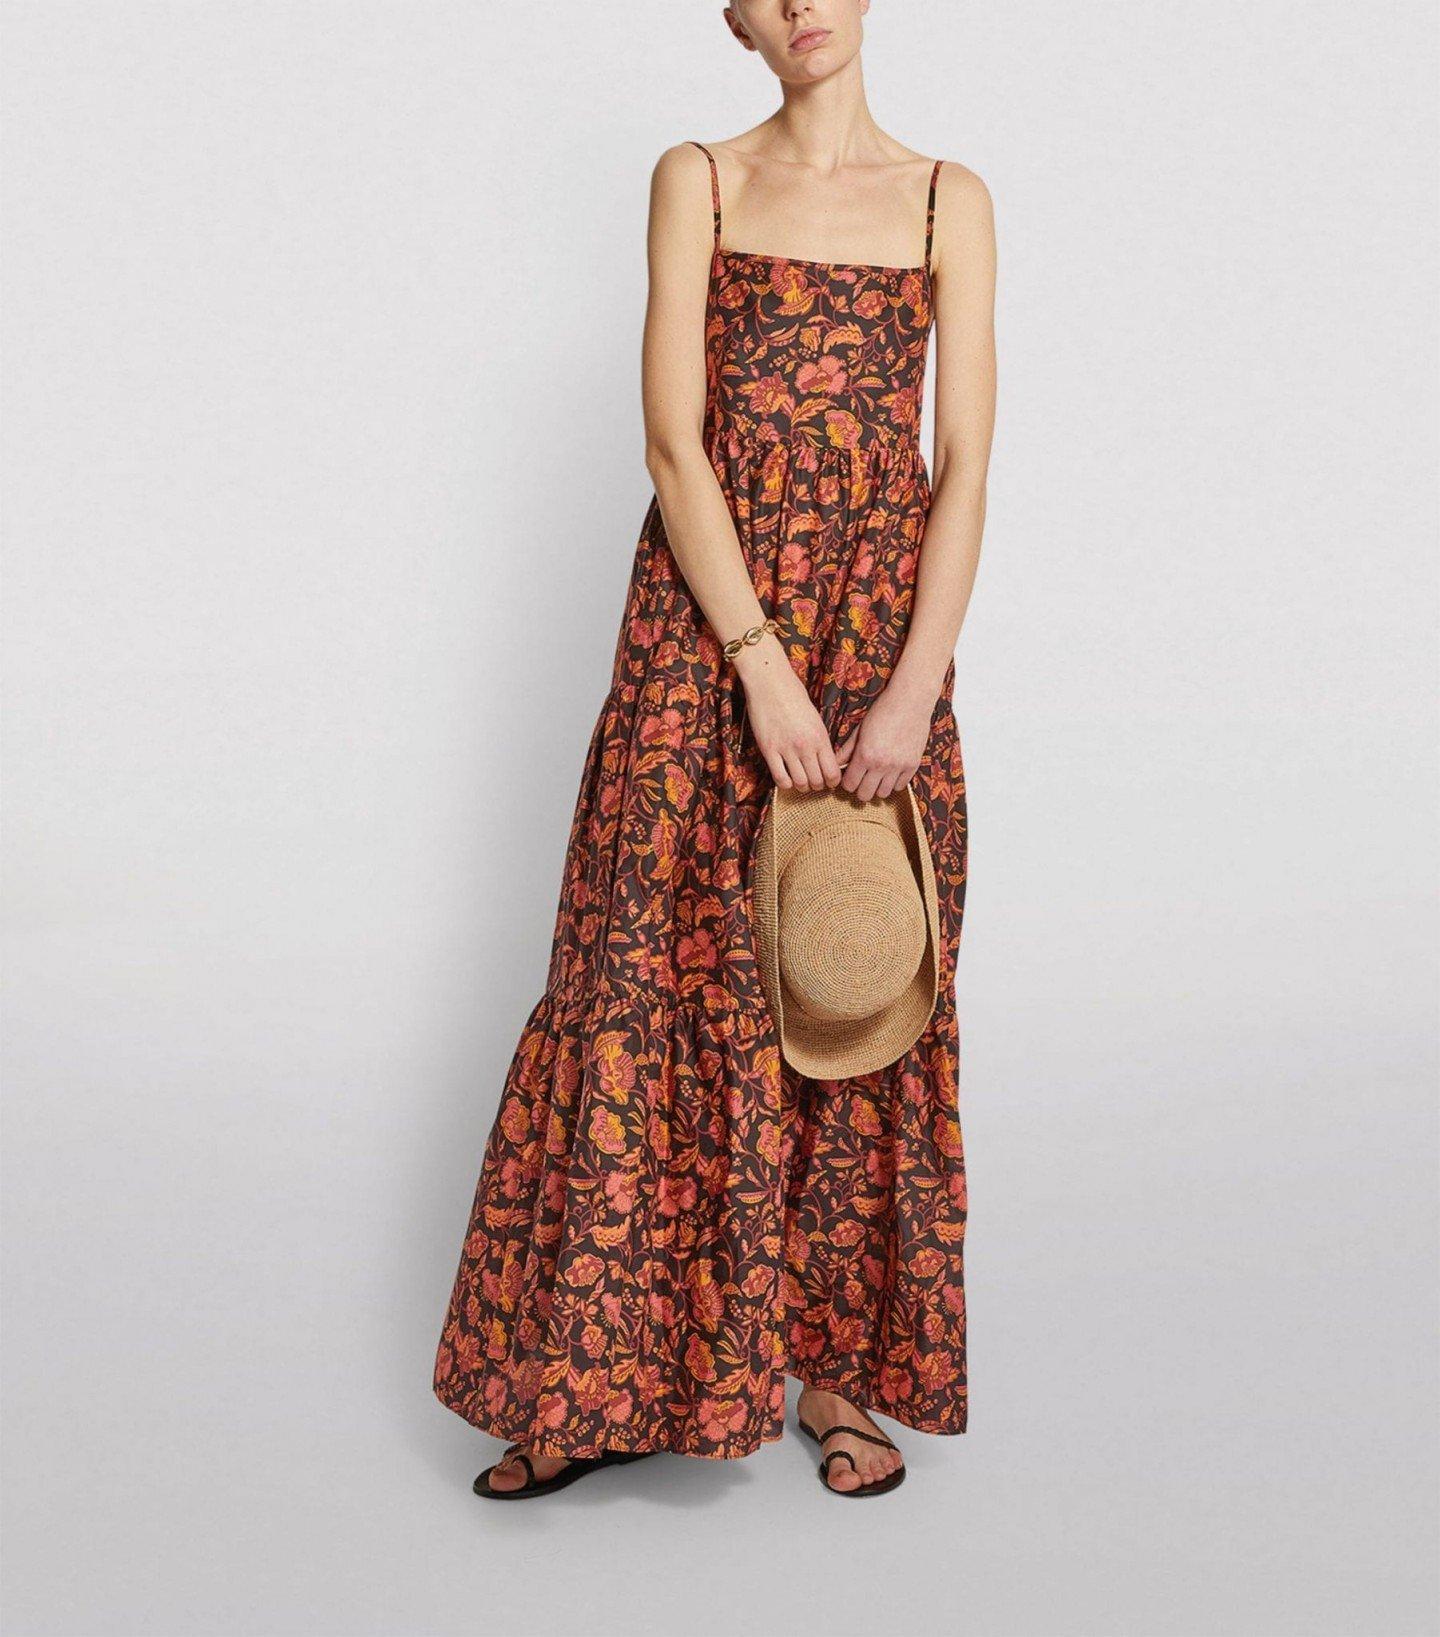 MATTEAU The Tiered Low-back Sun Dress